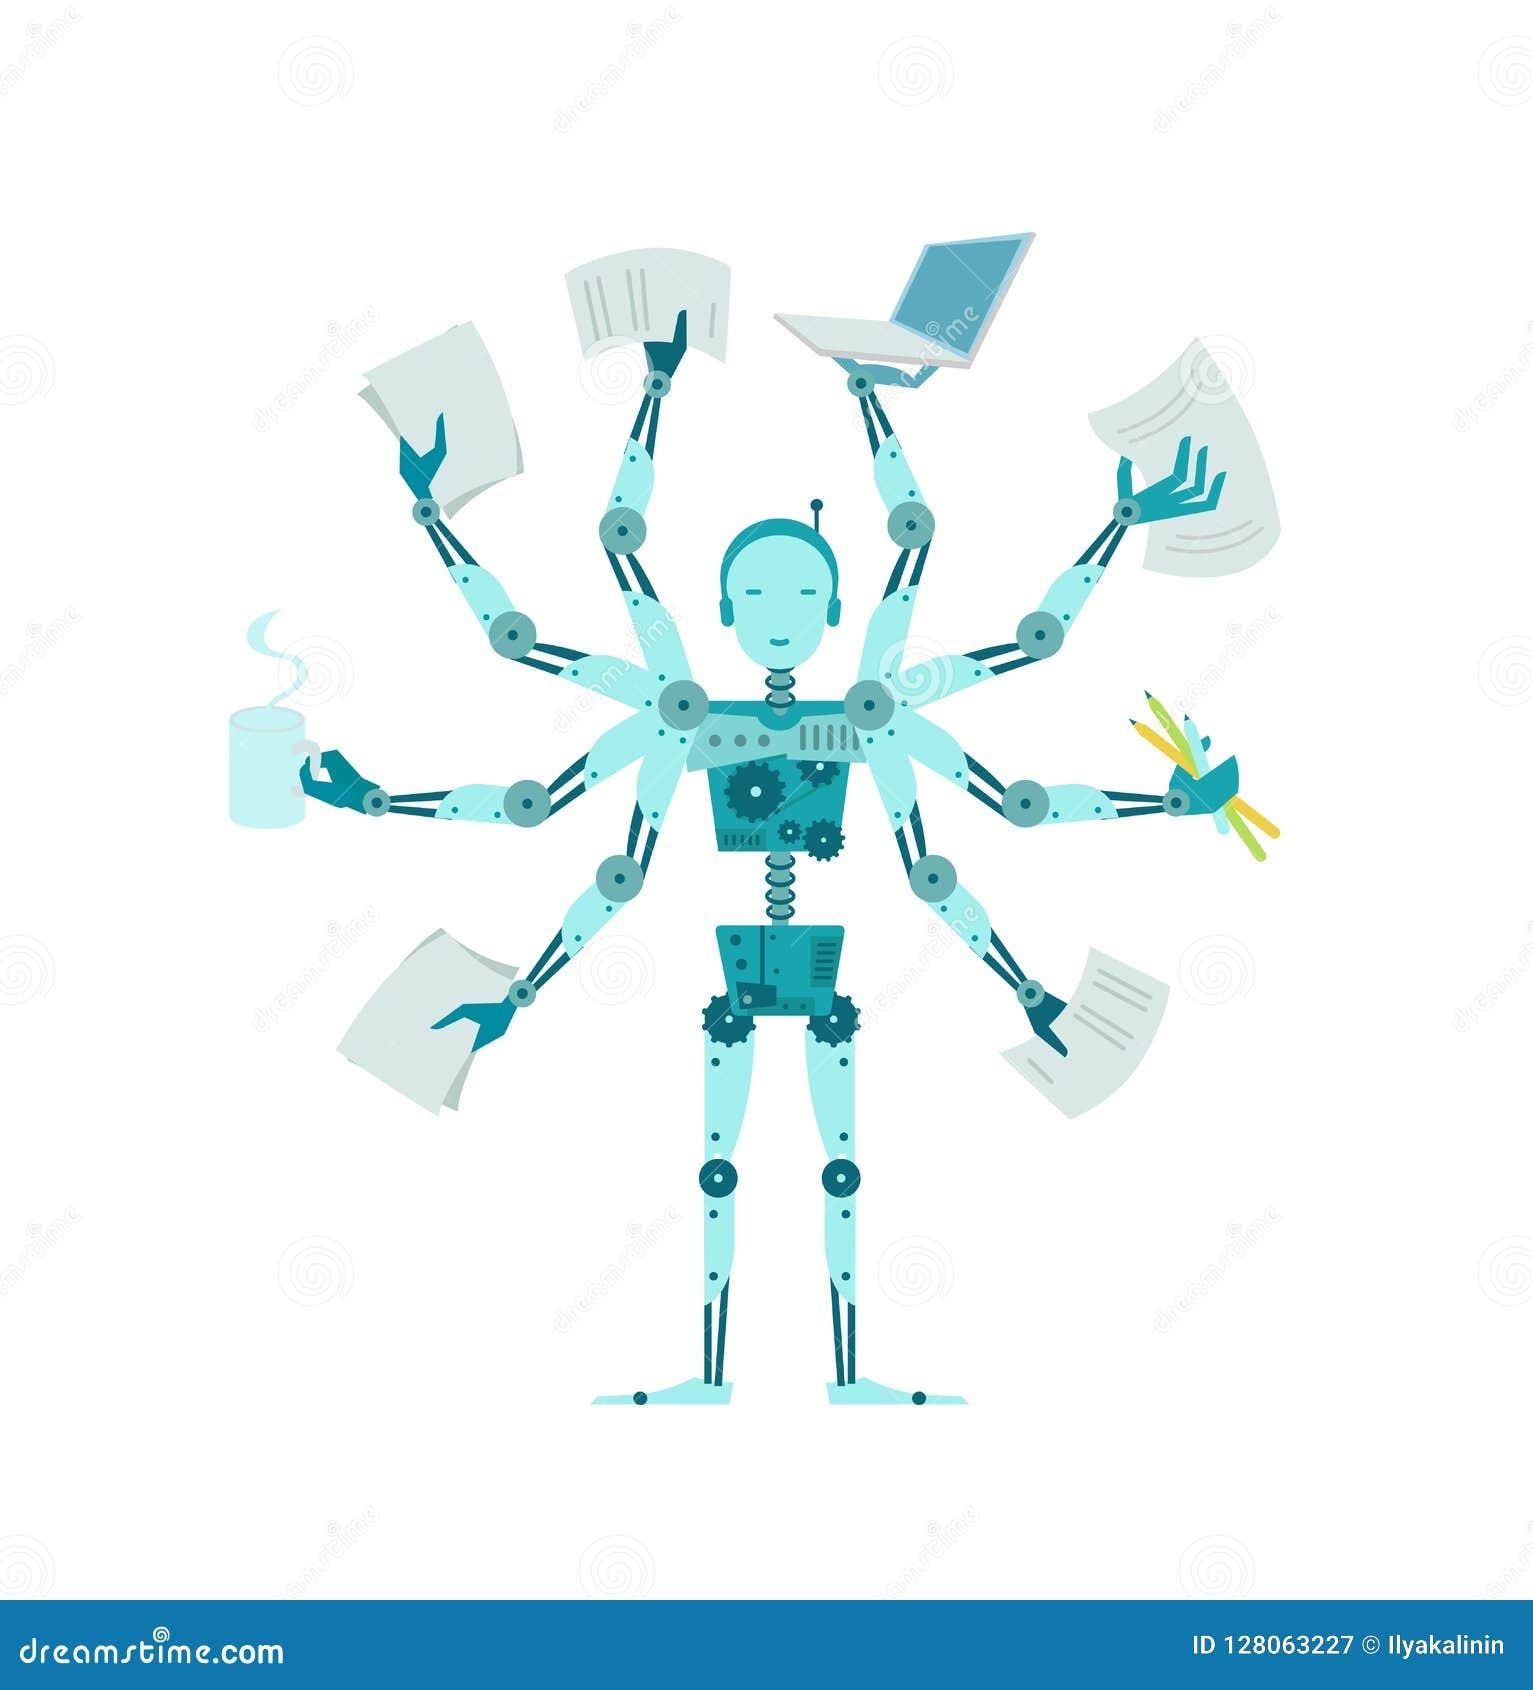 Der multilimbed Roboter Büro Multifunktionscyborgmanager